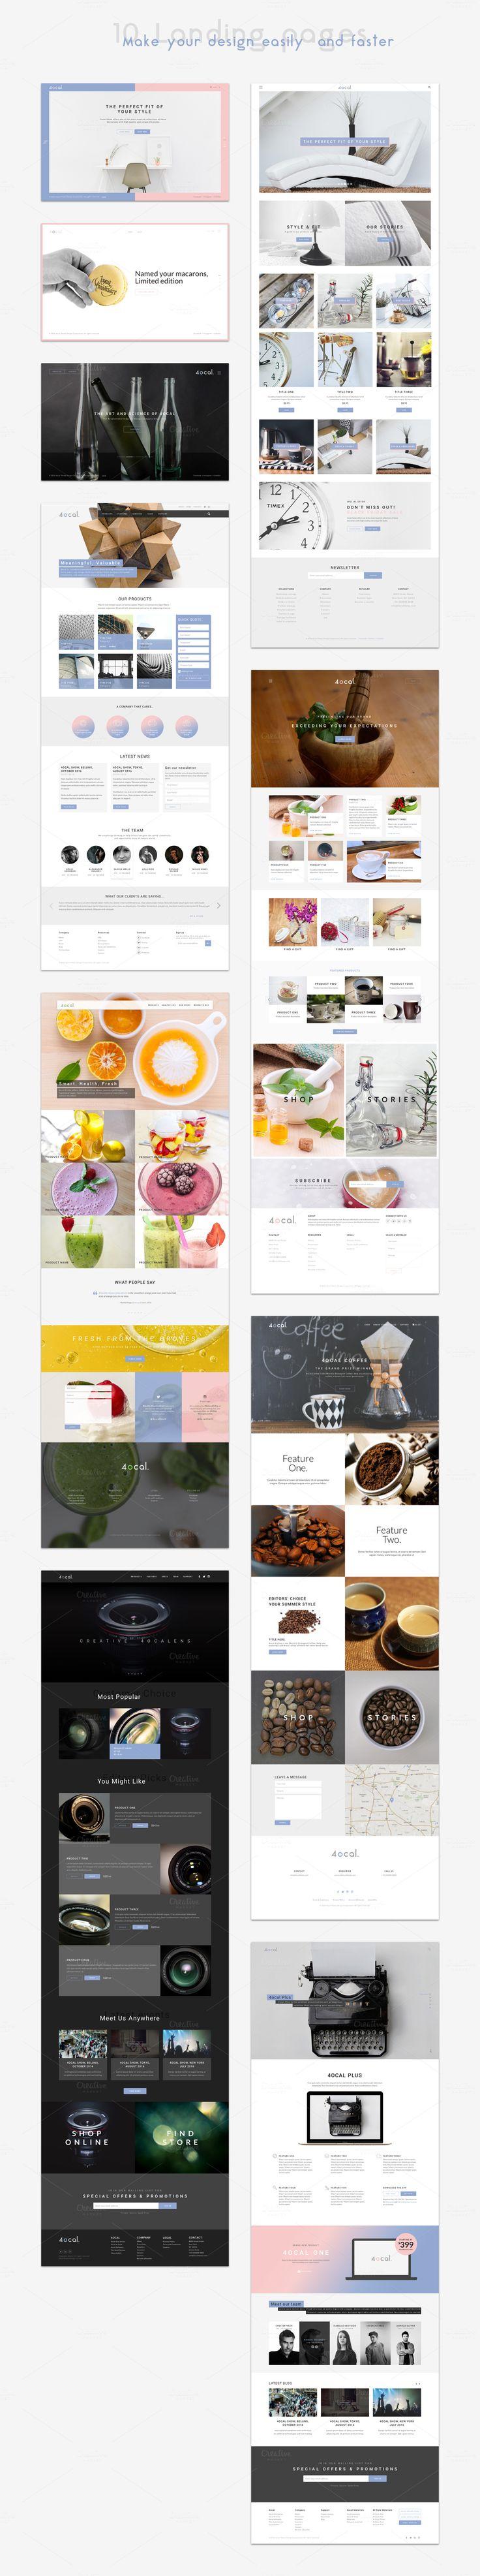 4ocal Web UI Kit for Sketch by 4EB Studio on @creativemarket